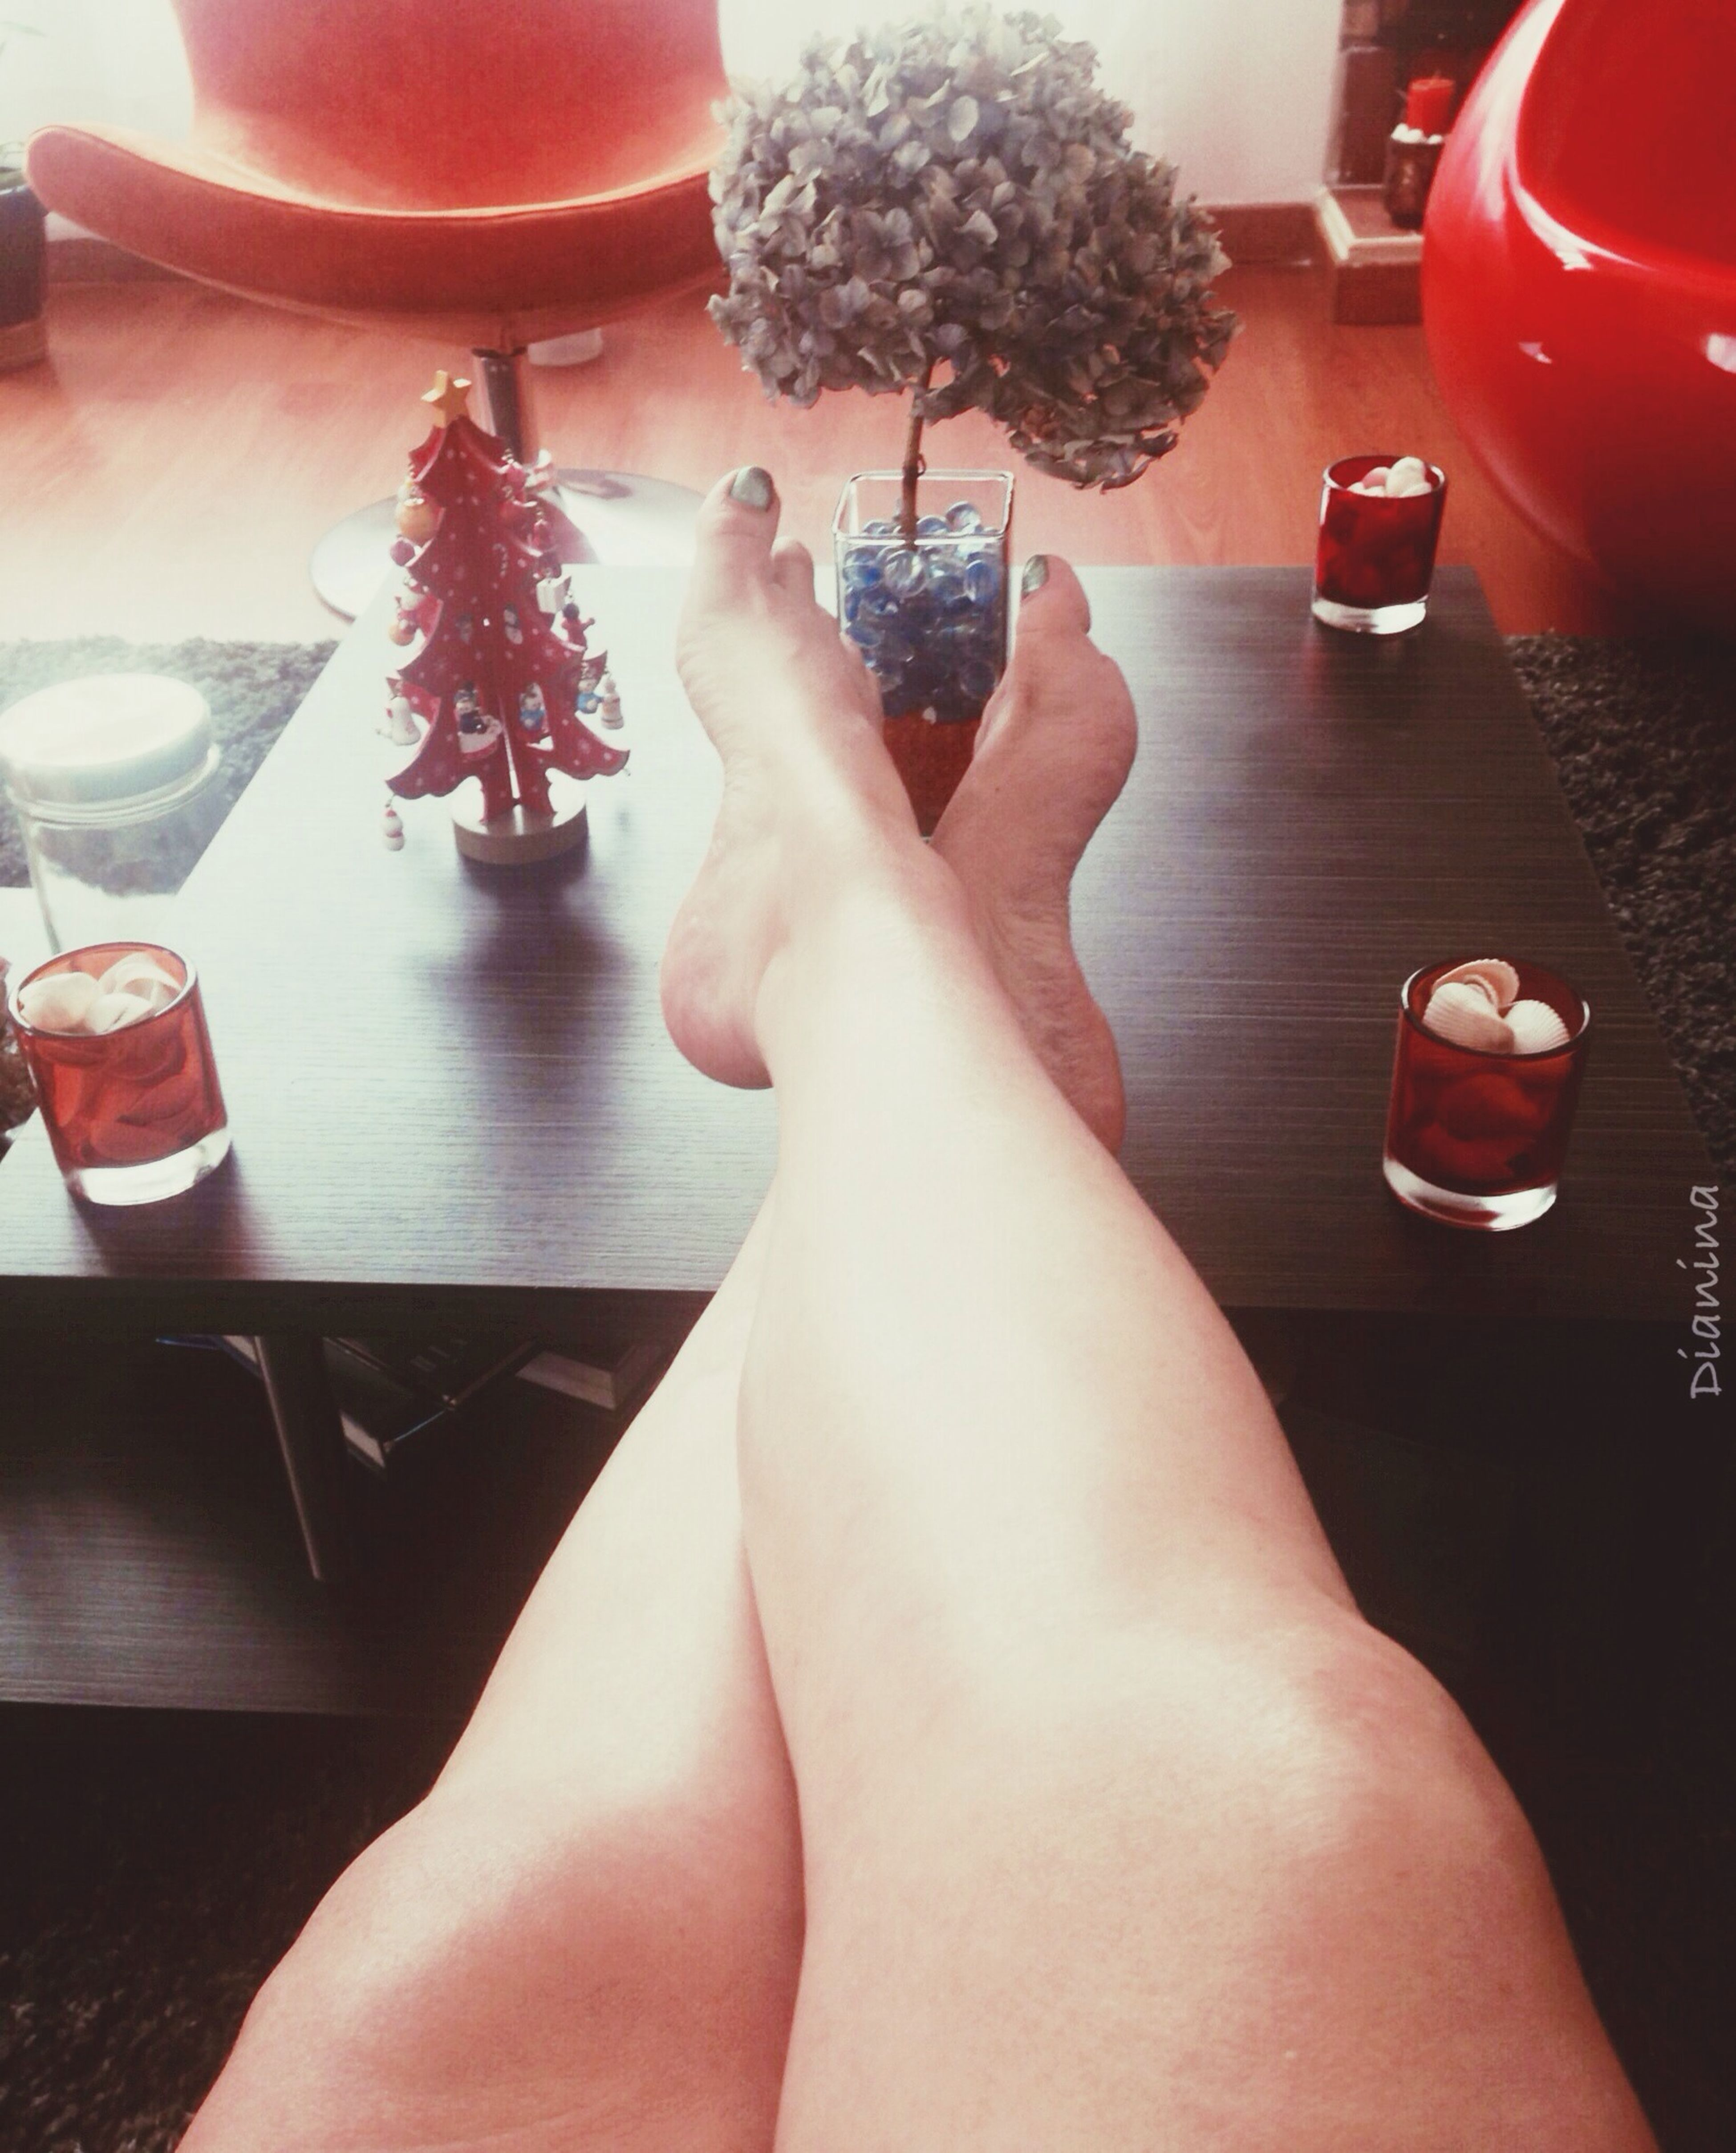 Domingo relax!! ???☀️ ❤️sunday...relax! Legs